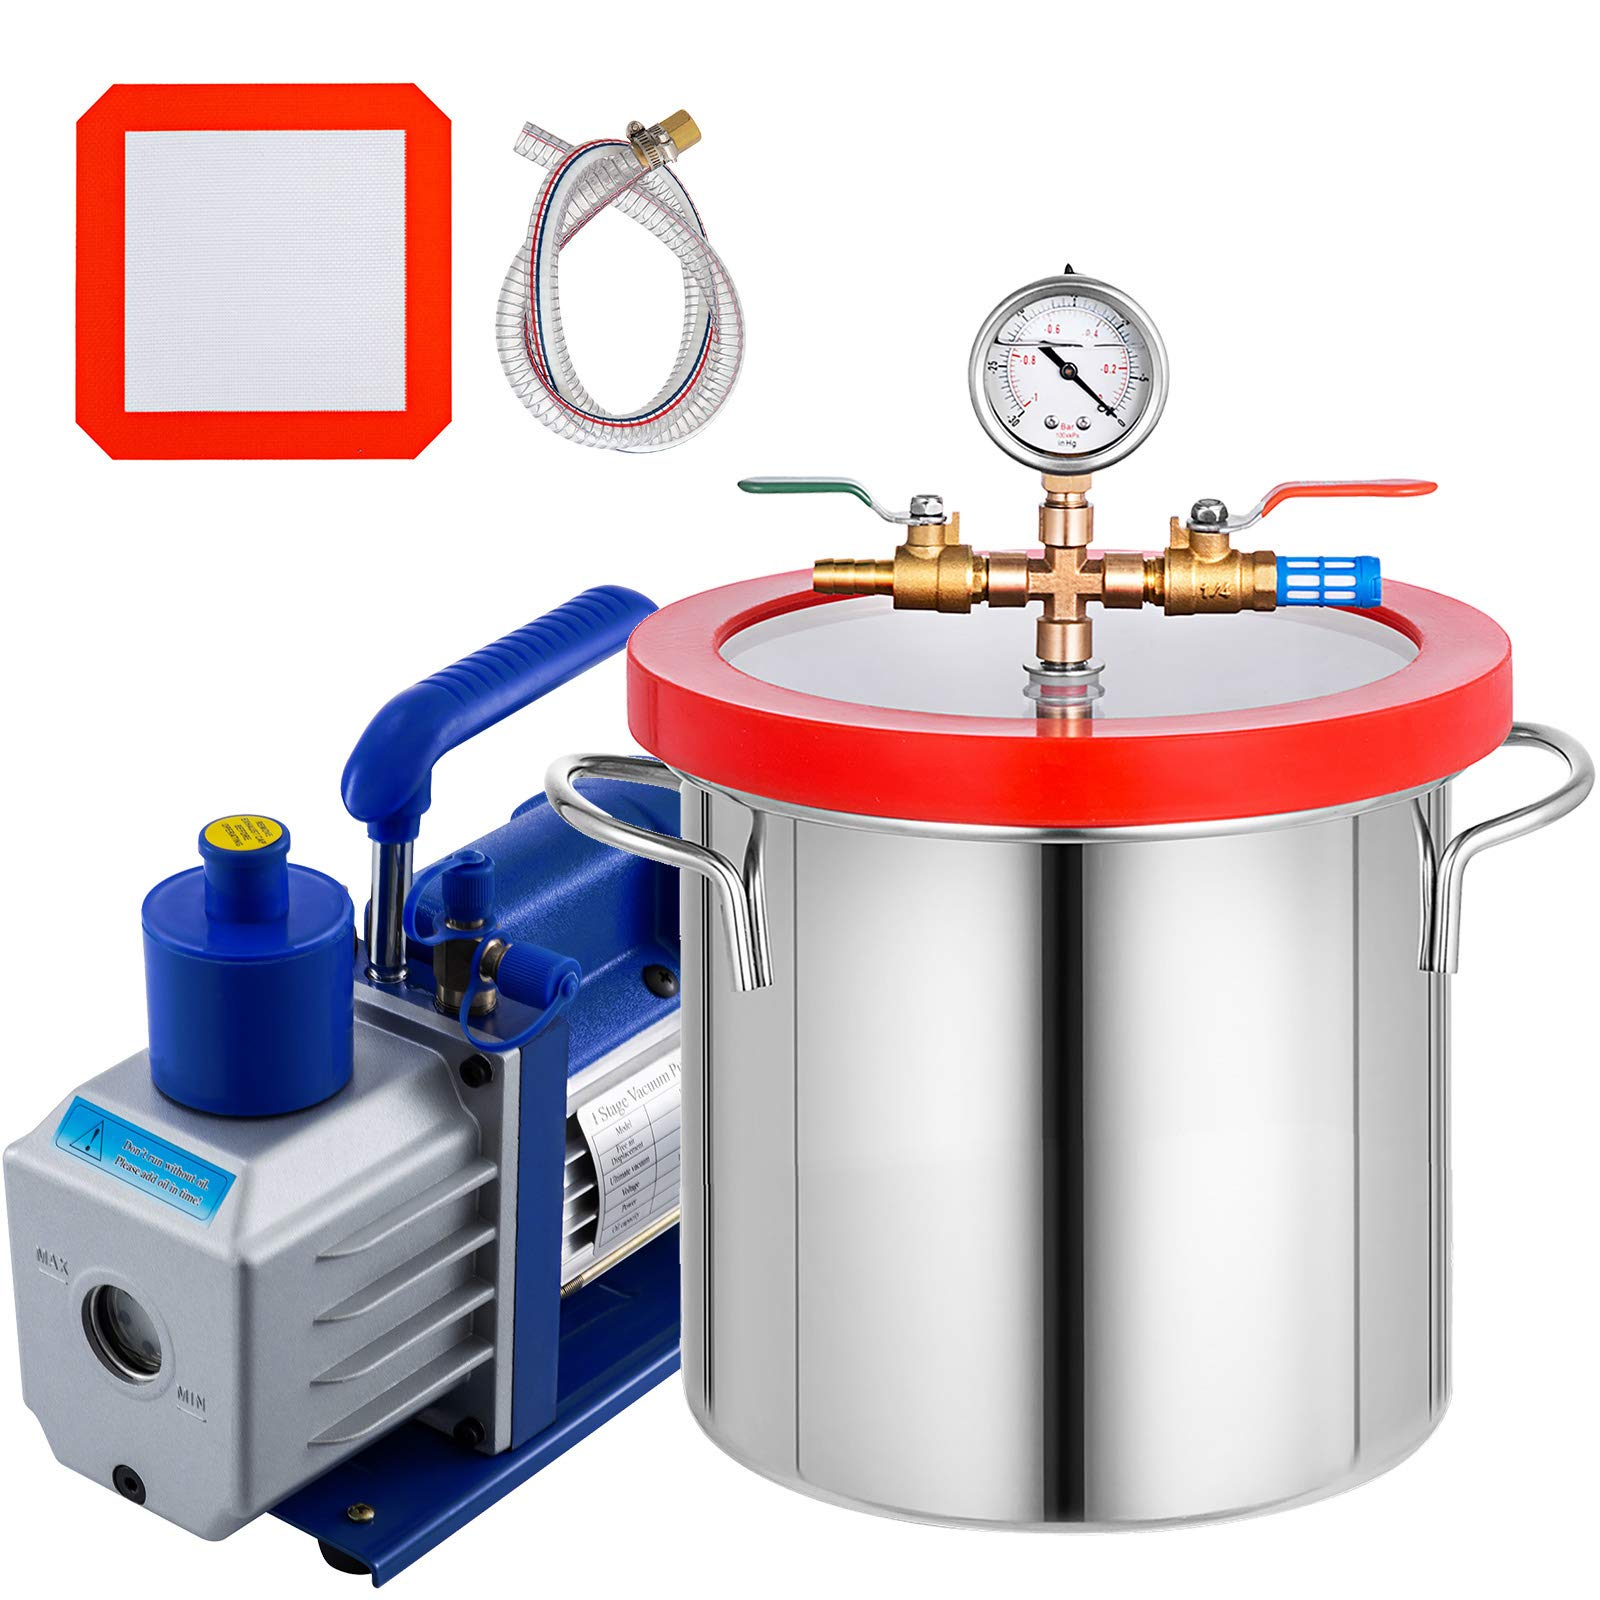 Bestauto 2 Gallon Vacuum Degassing Chamber Stainless Steel Degassing Chamber 7.5L Vacuum Chamber with 5 CFM 1/3HP Single Stage Pump Kit(2 Gallon Vacuum Chamber+ 5CFM Pump) by Bestauto